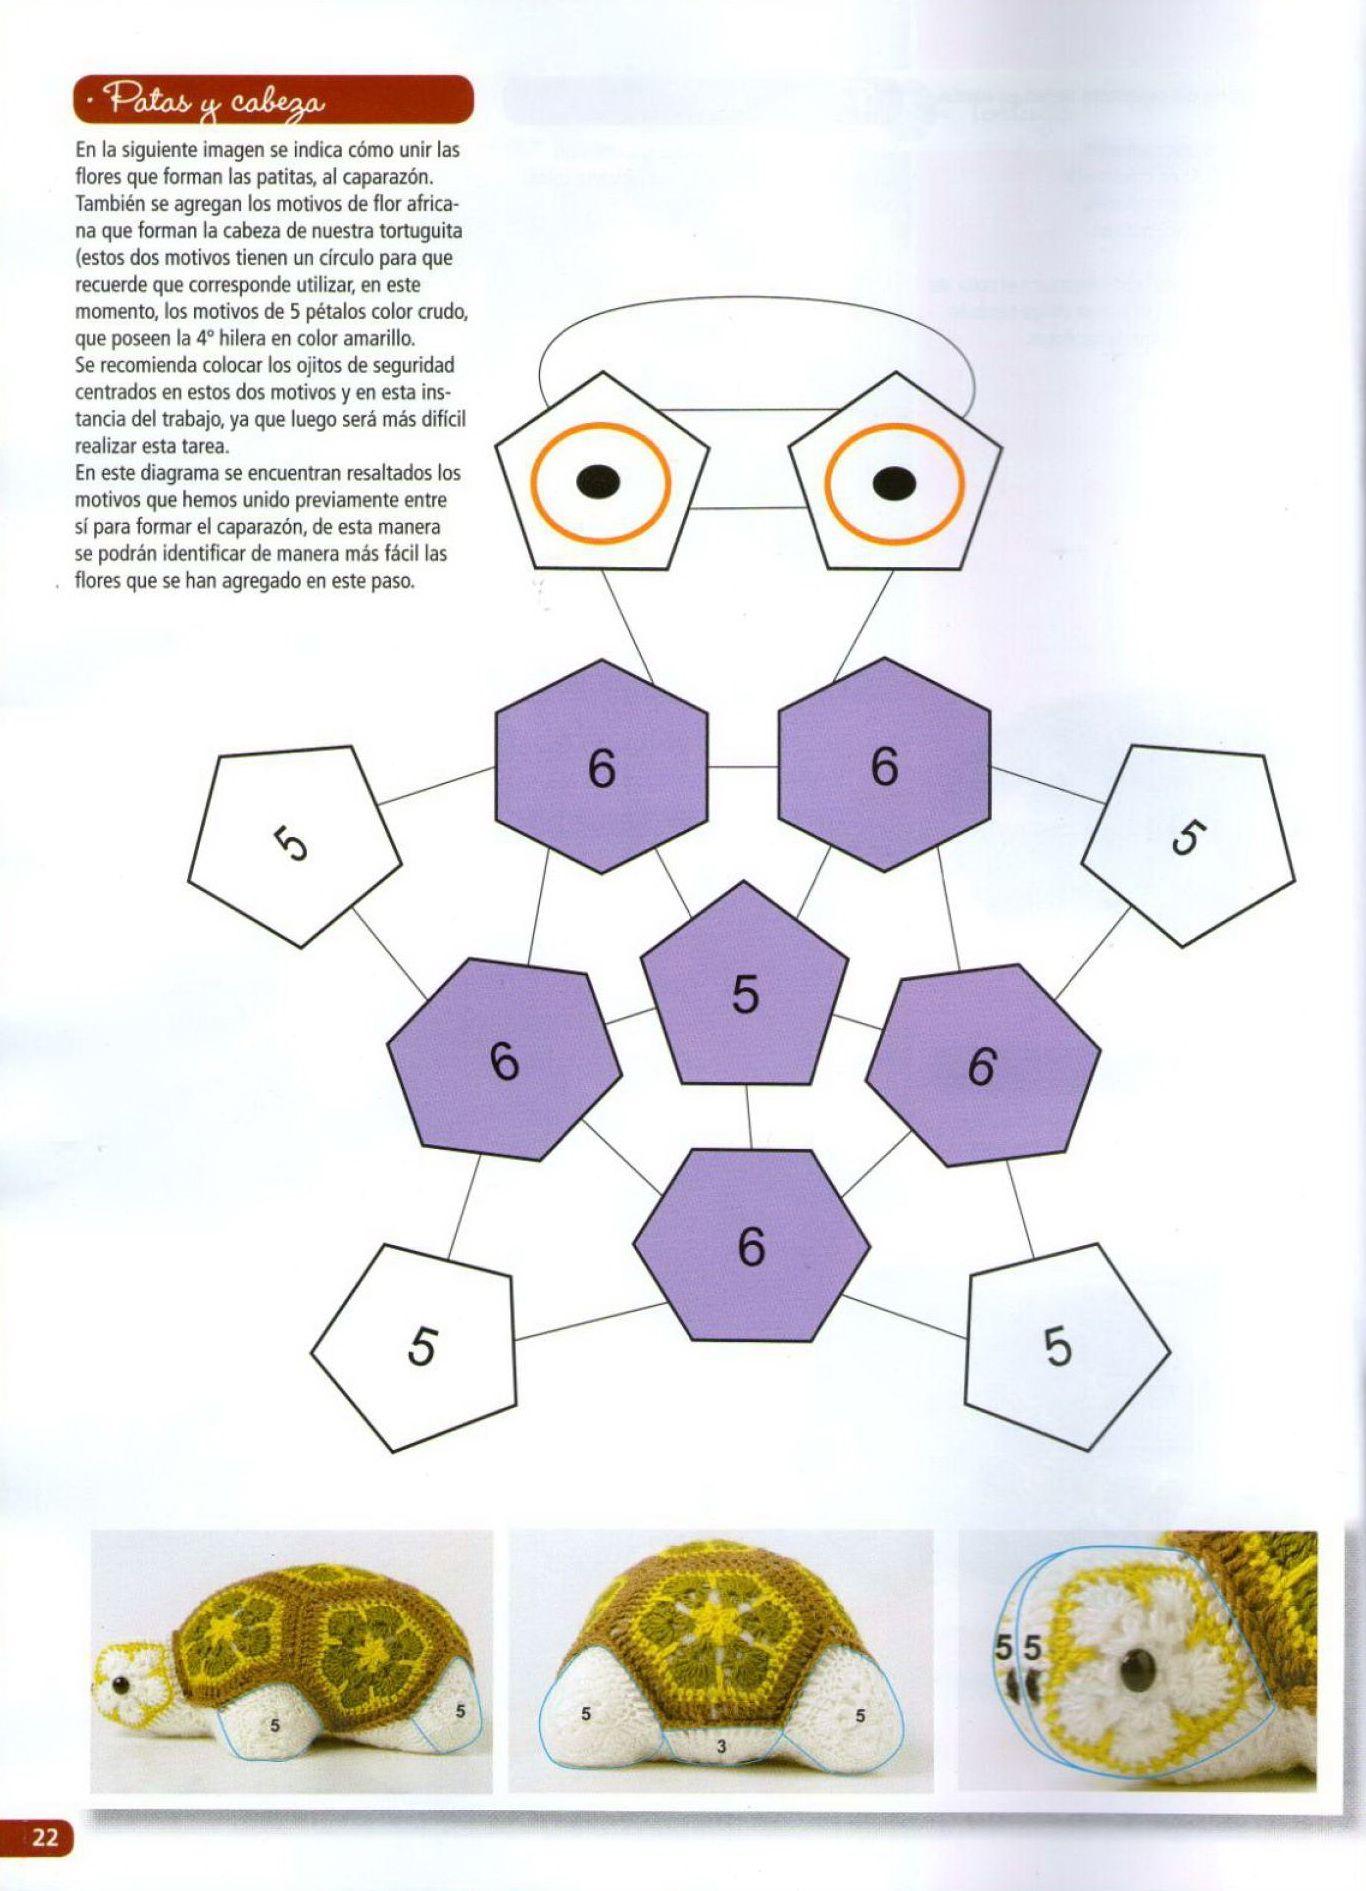 African Flower Turtle Free Pattern 3 4 Not In English C Rose Crochet Flores Crochetflowers Pretty Diagram